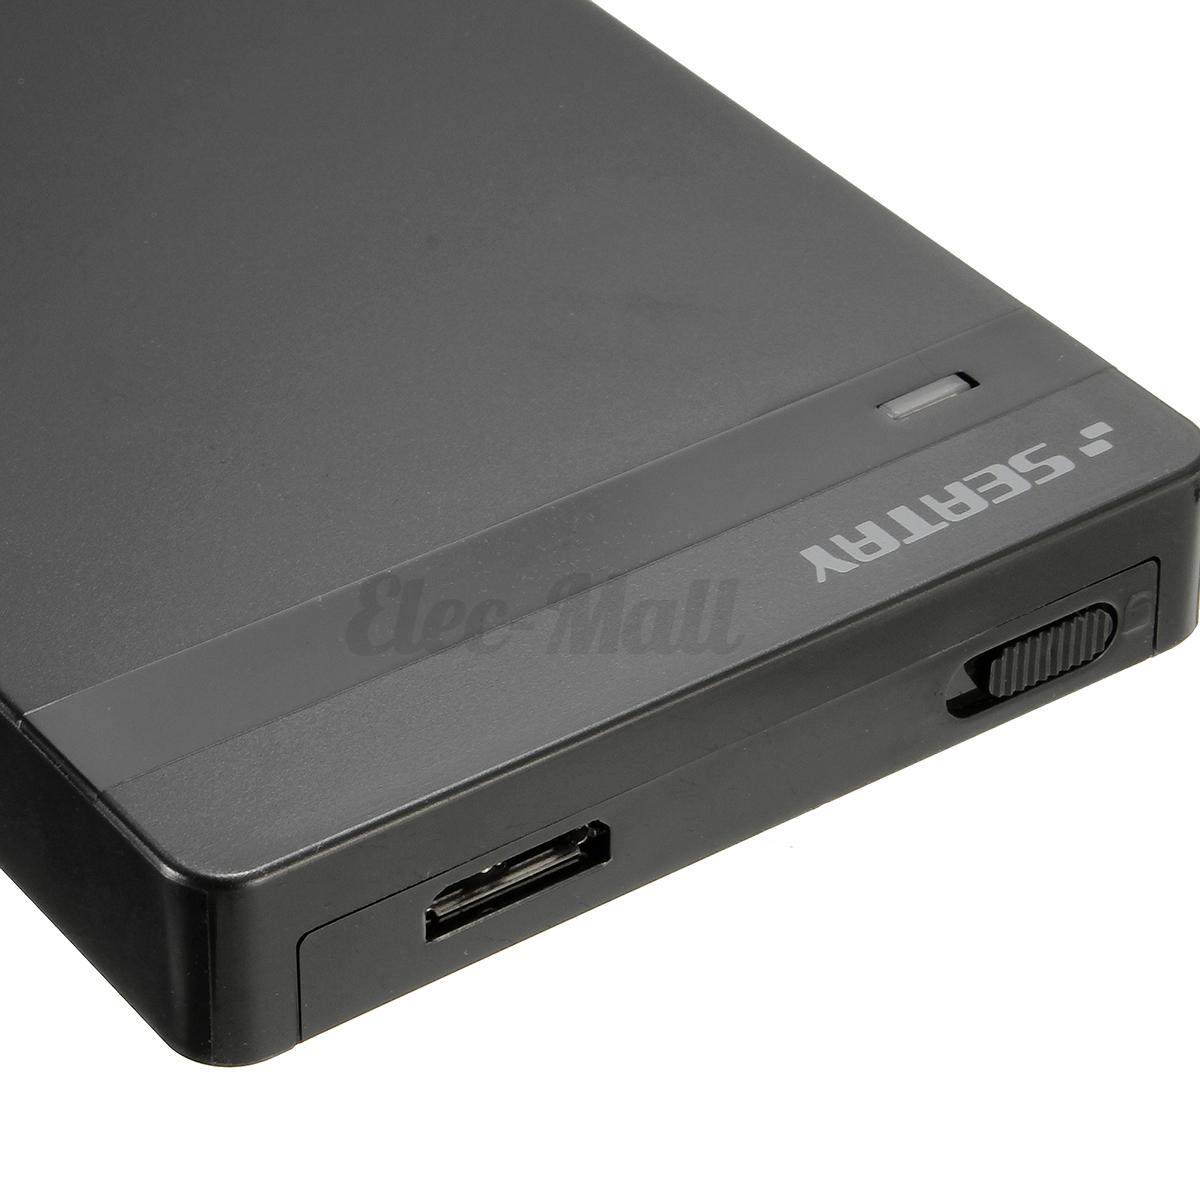 2 5 39 39 portable usb 3 0 external hard drive hdd sata disk - Porta hard disk esterno 2 5 ...